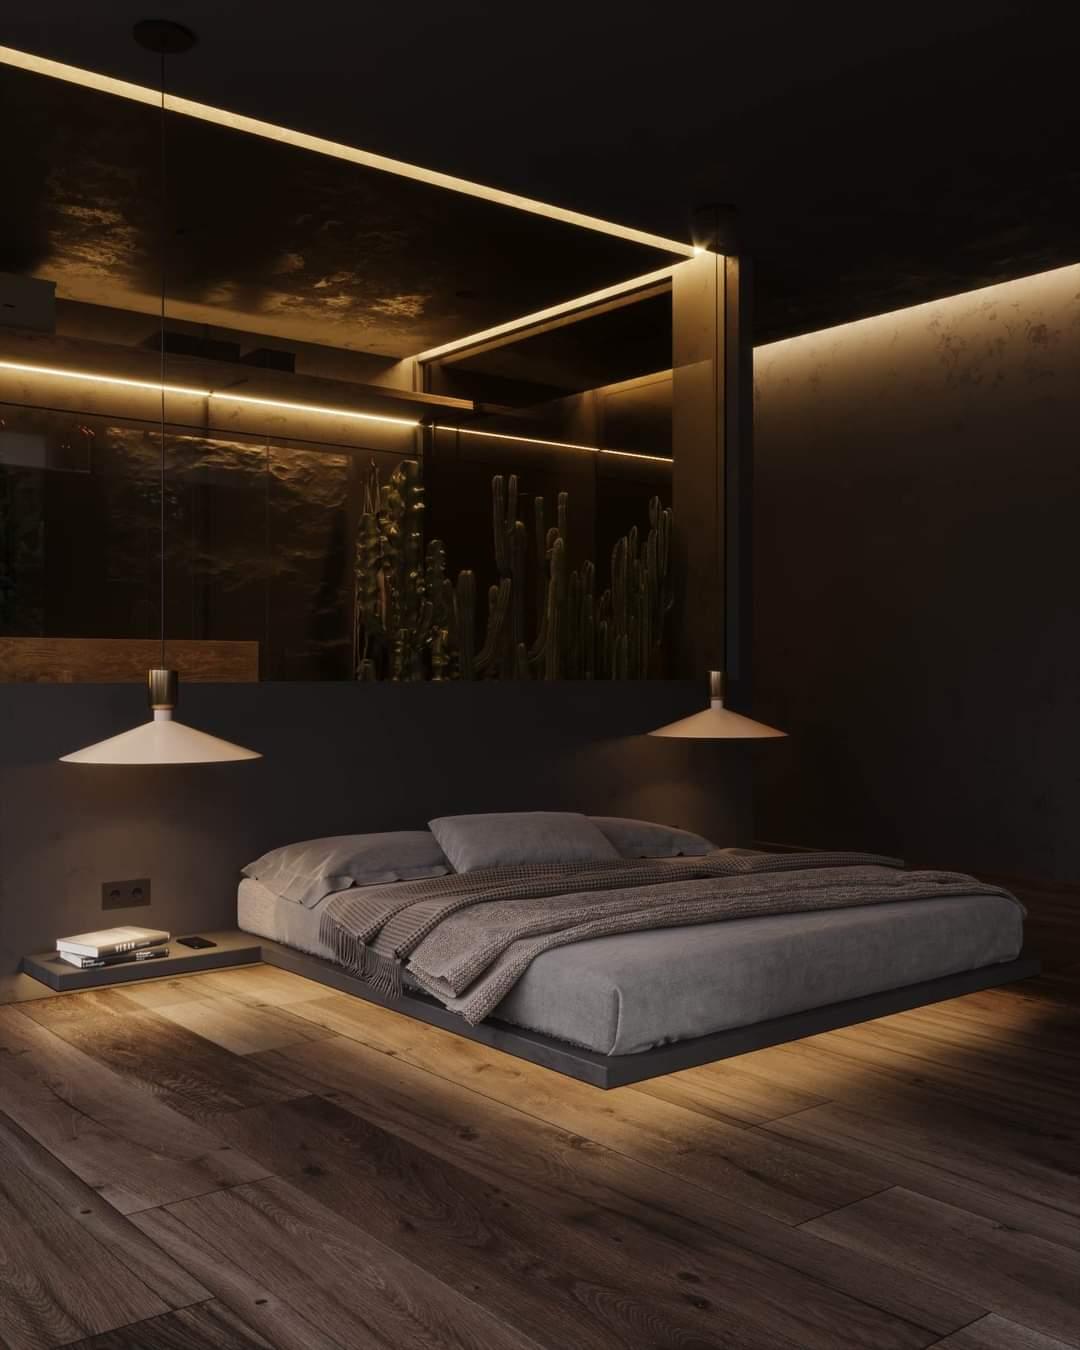 Magical Black Bedroom Set Up - Source: Kireevaaanna